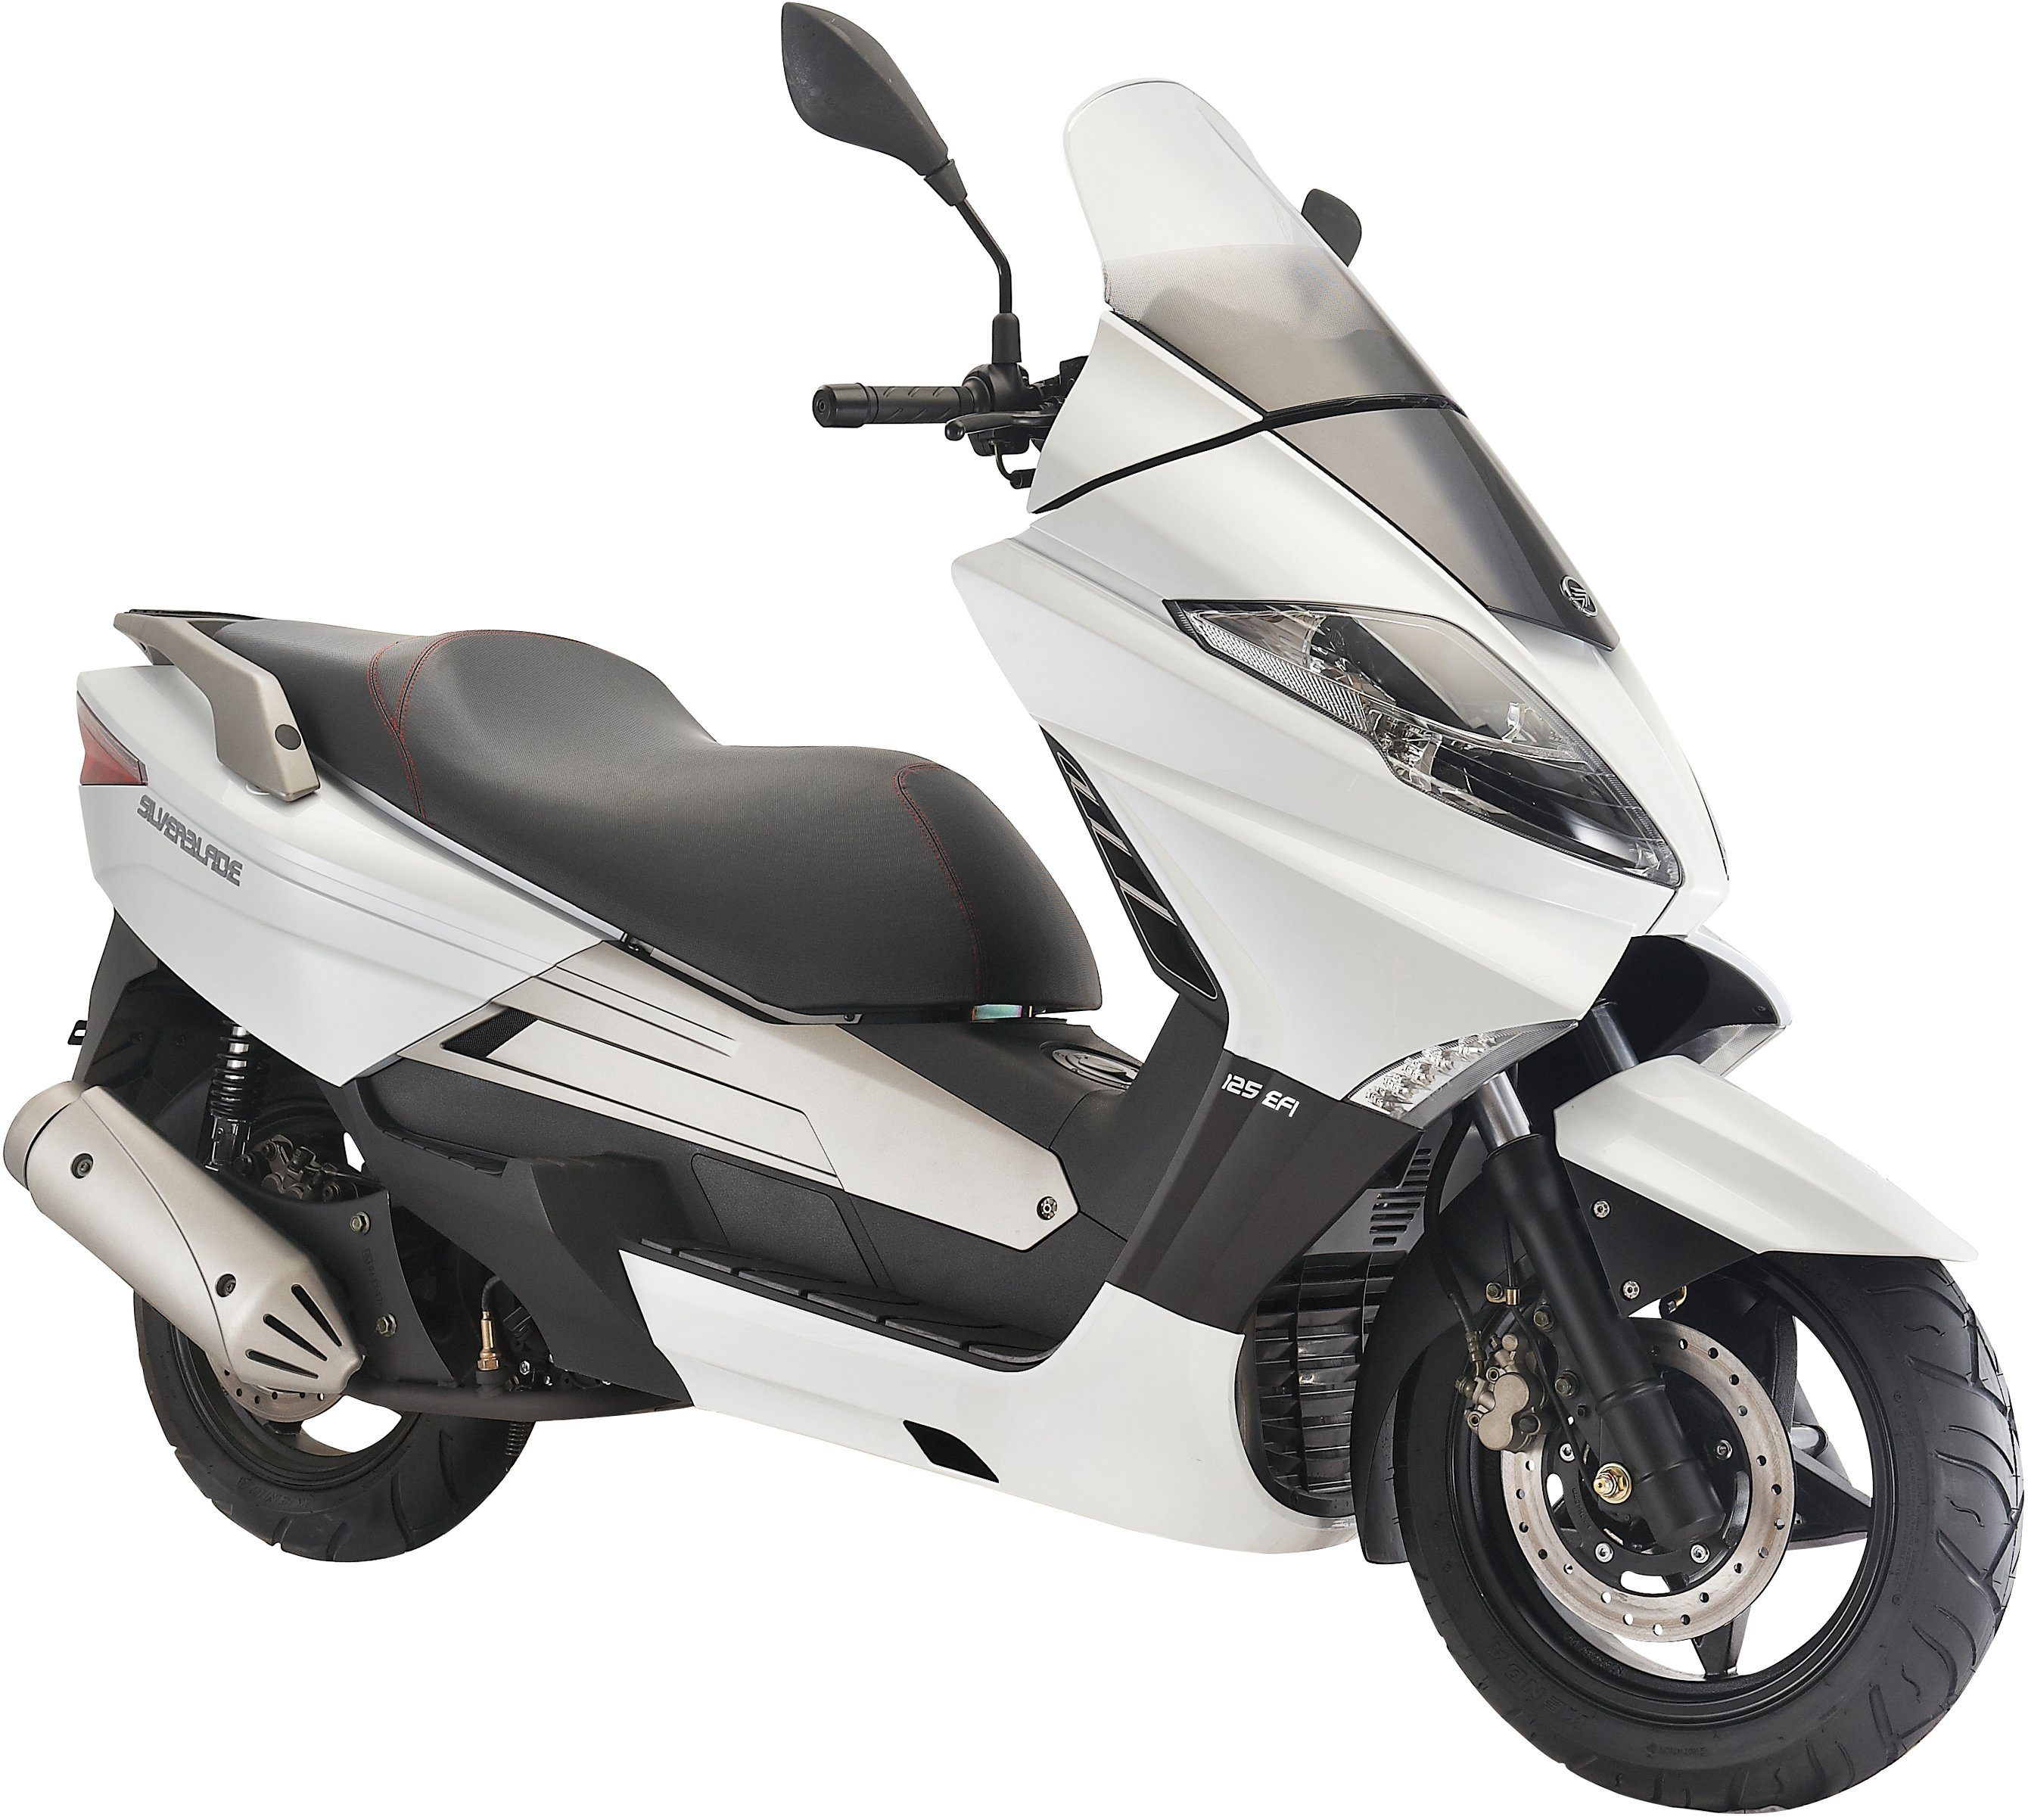 Keeway Motorroller, 125 ccm, 100 km/h, »Silver Blade«